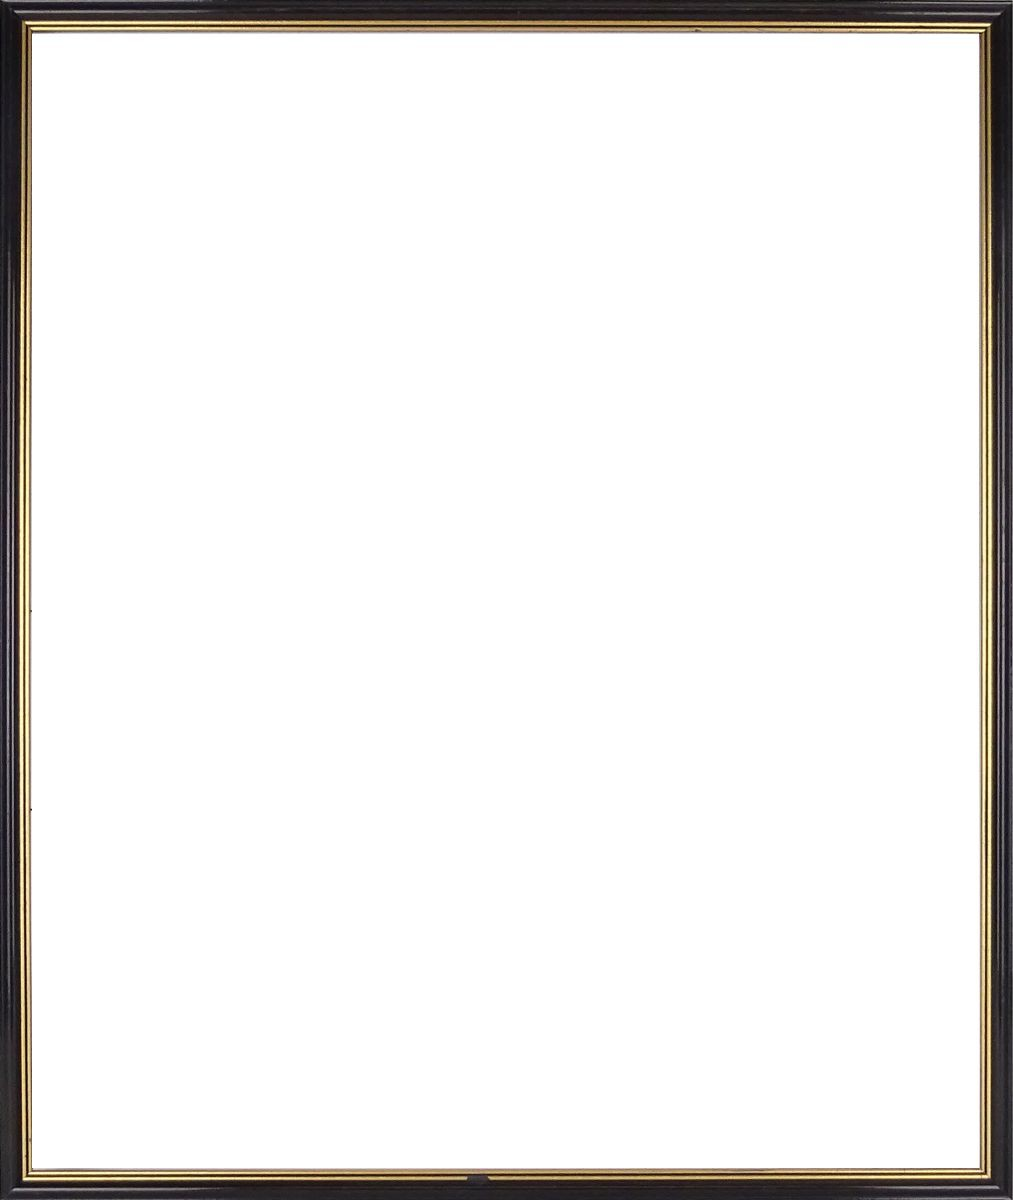 DSC01982.JPG (1013×1200)